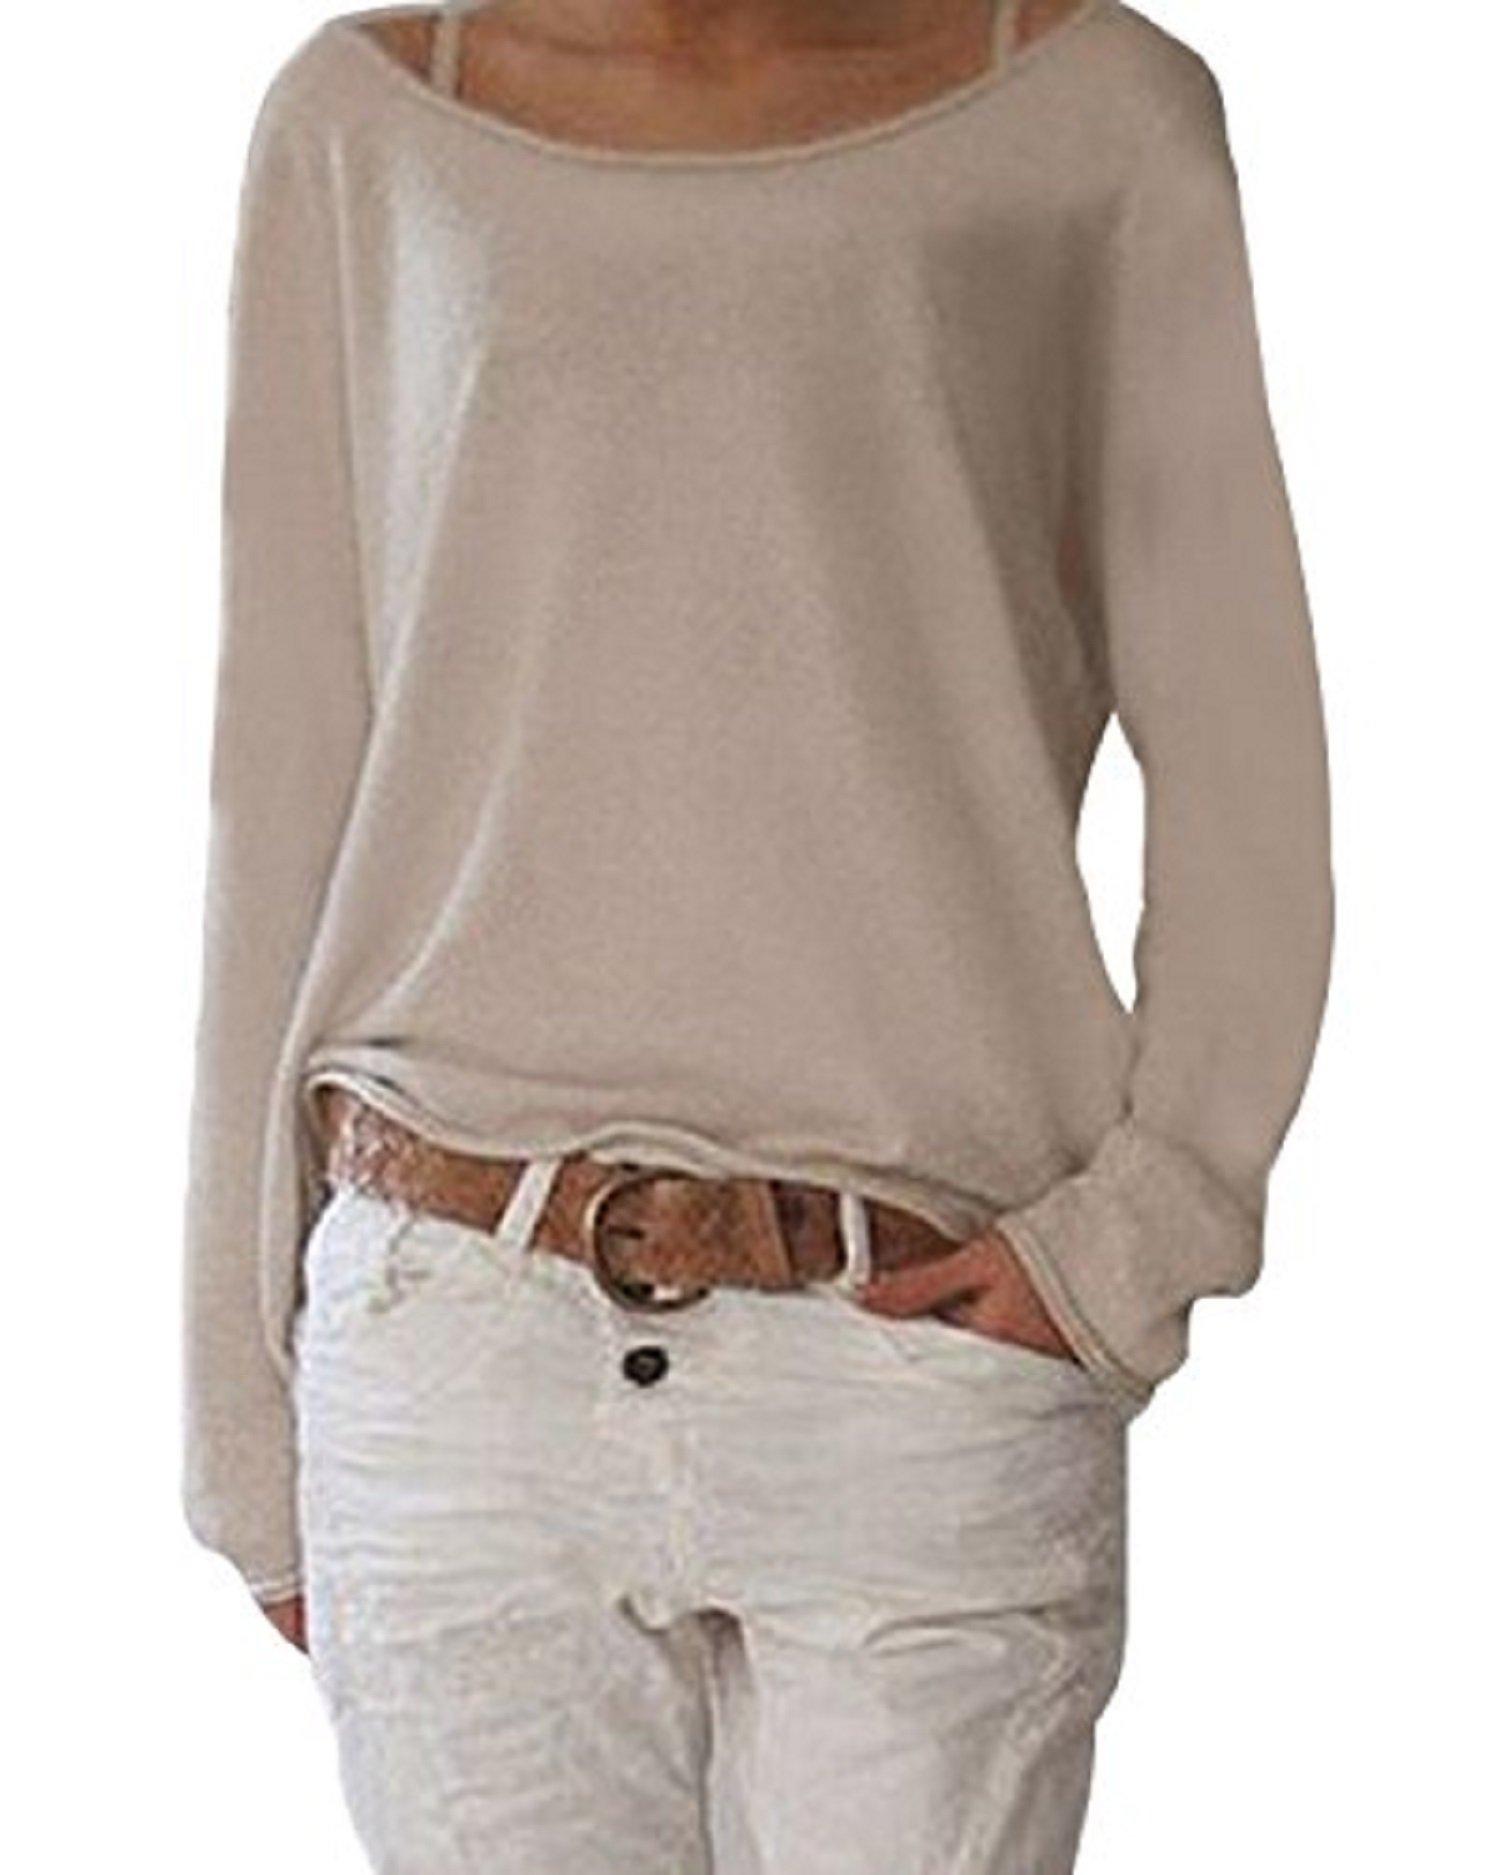 d8b1eab8dc1f91 ZANZEA Damen Langarm Lose Bluse Hemd Shirt Oversize Sweatshirt Oberteil Tops